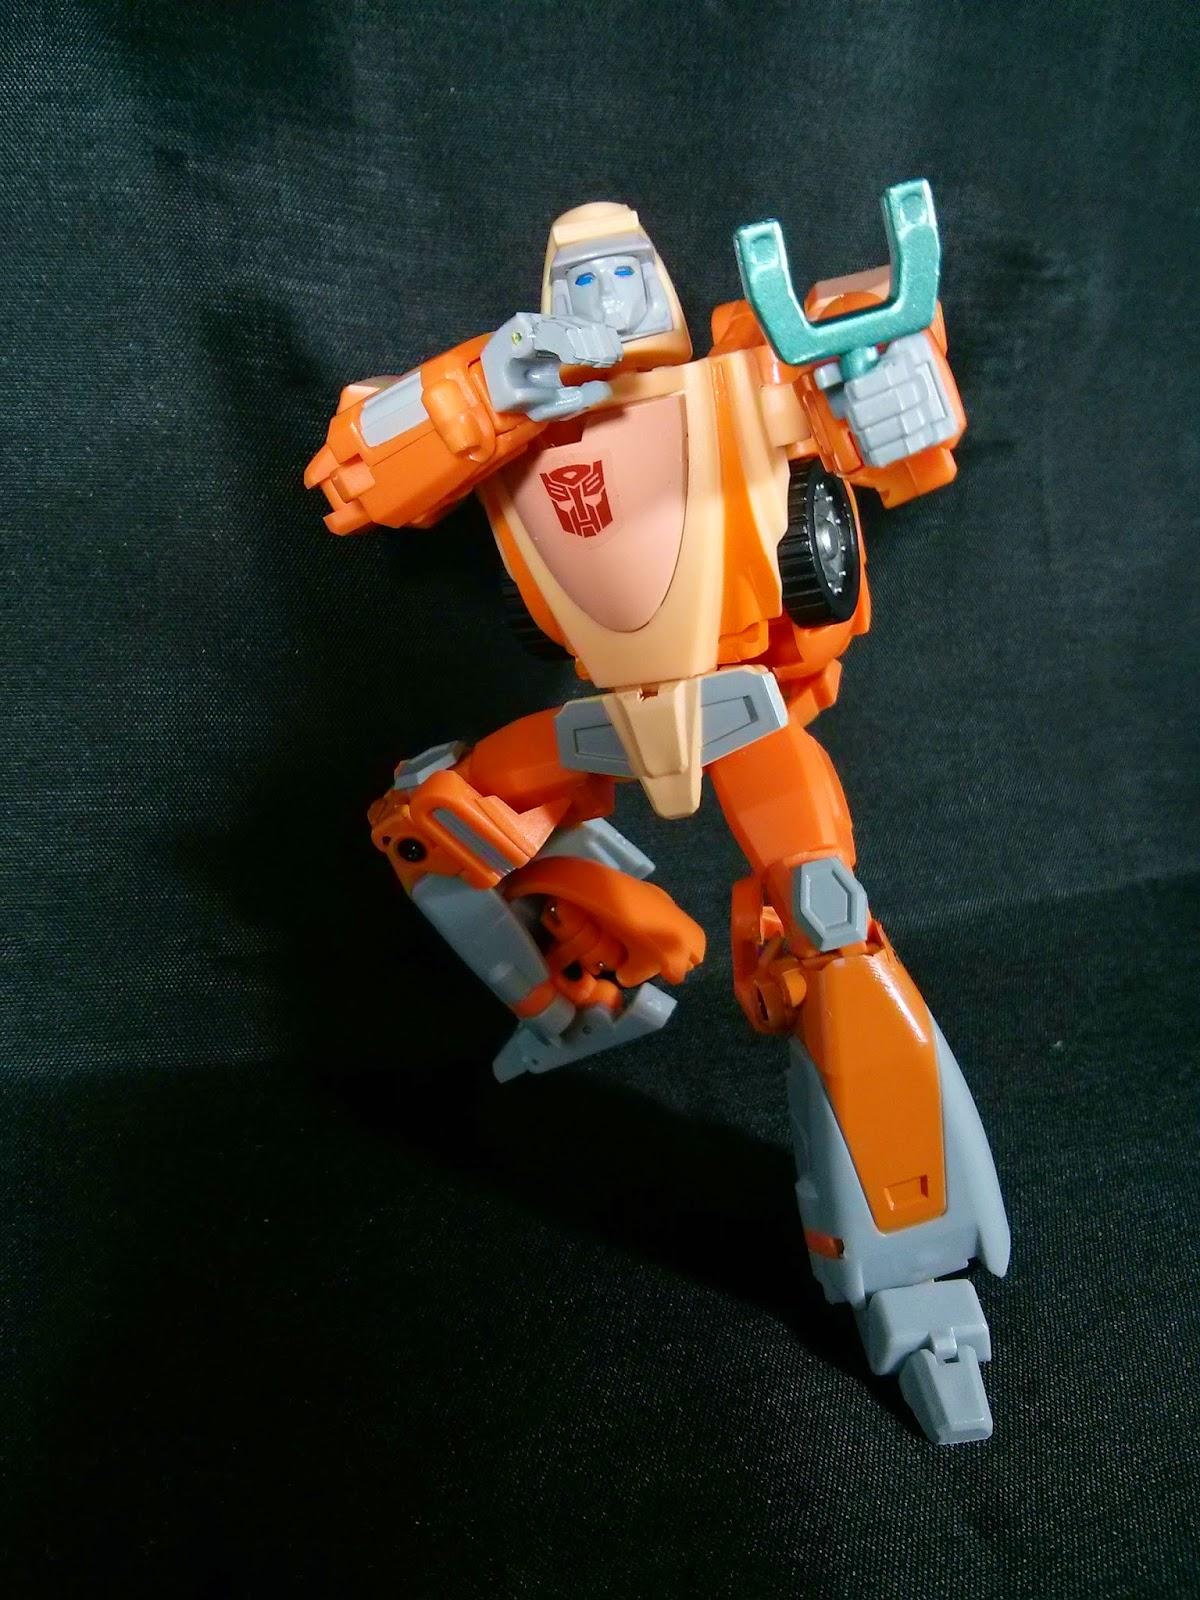 x-transbots ollie